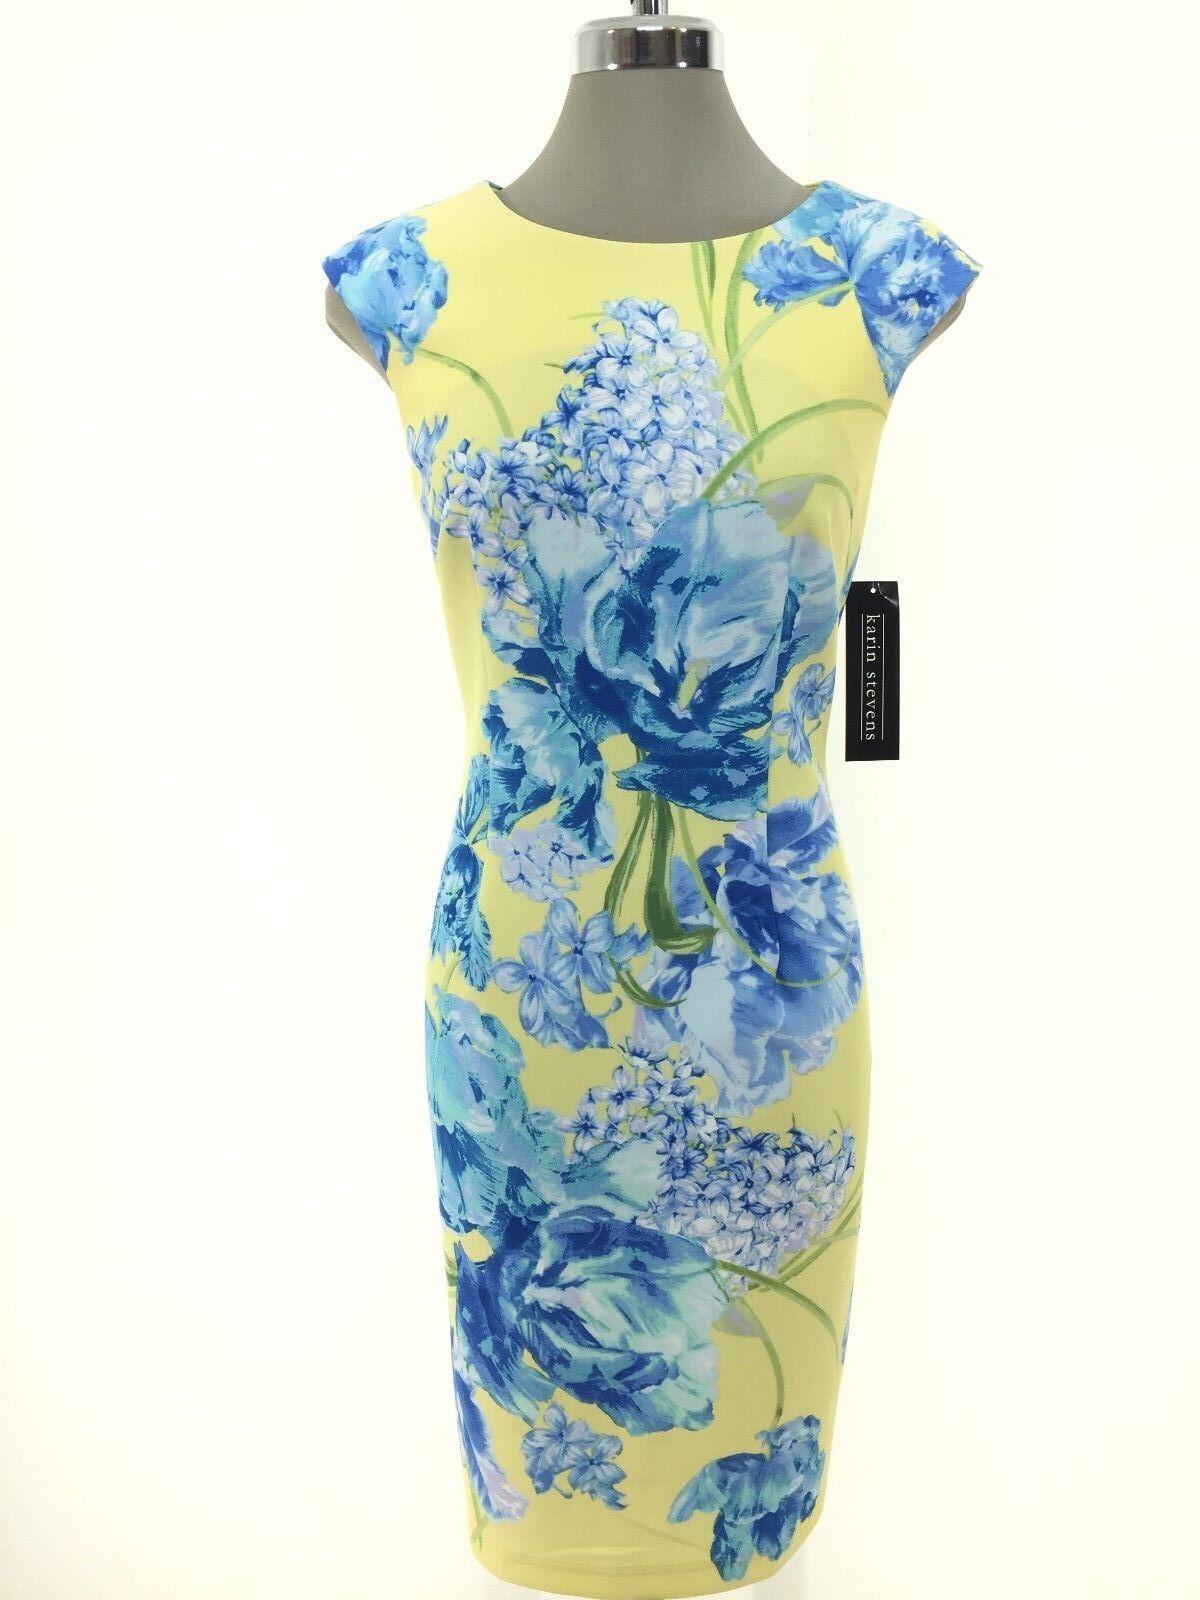 Karin Stevens NWT Modern blueE YELLOW Floral print Scuba Dress 6 8 10 12 14 16